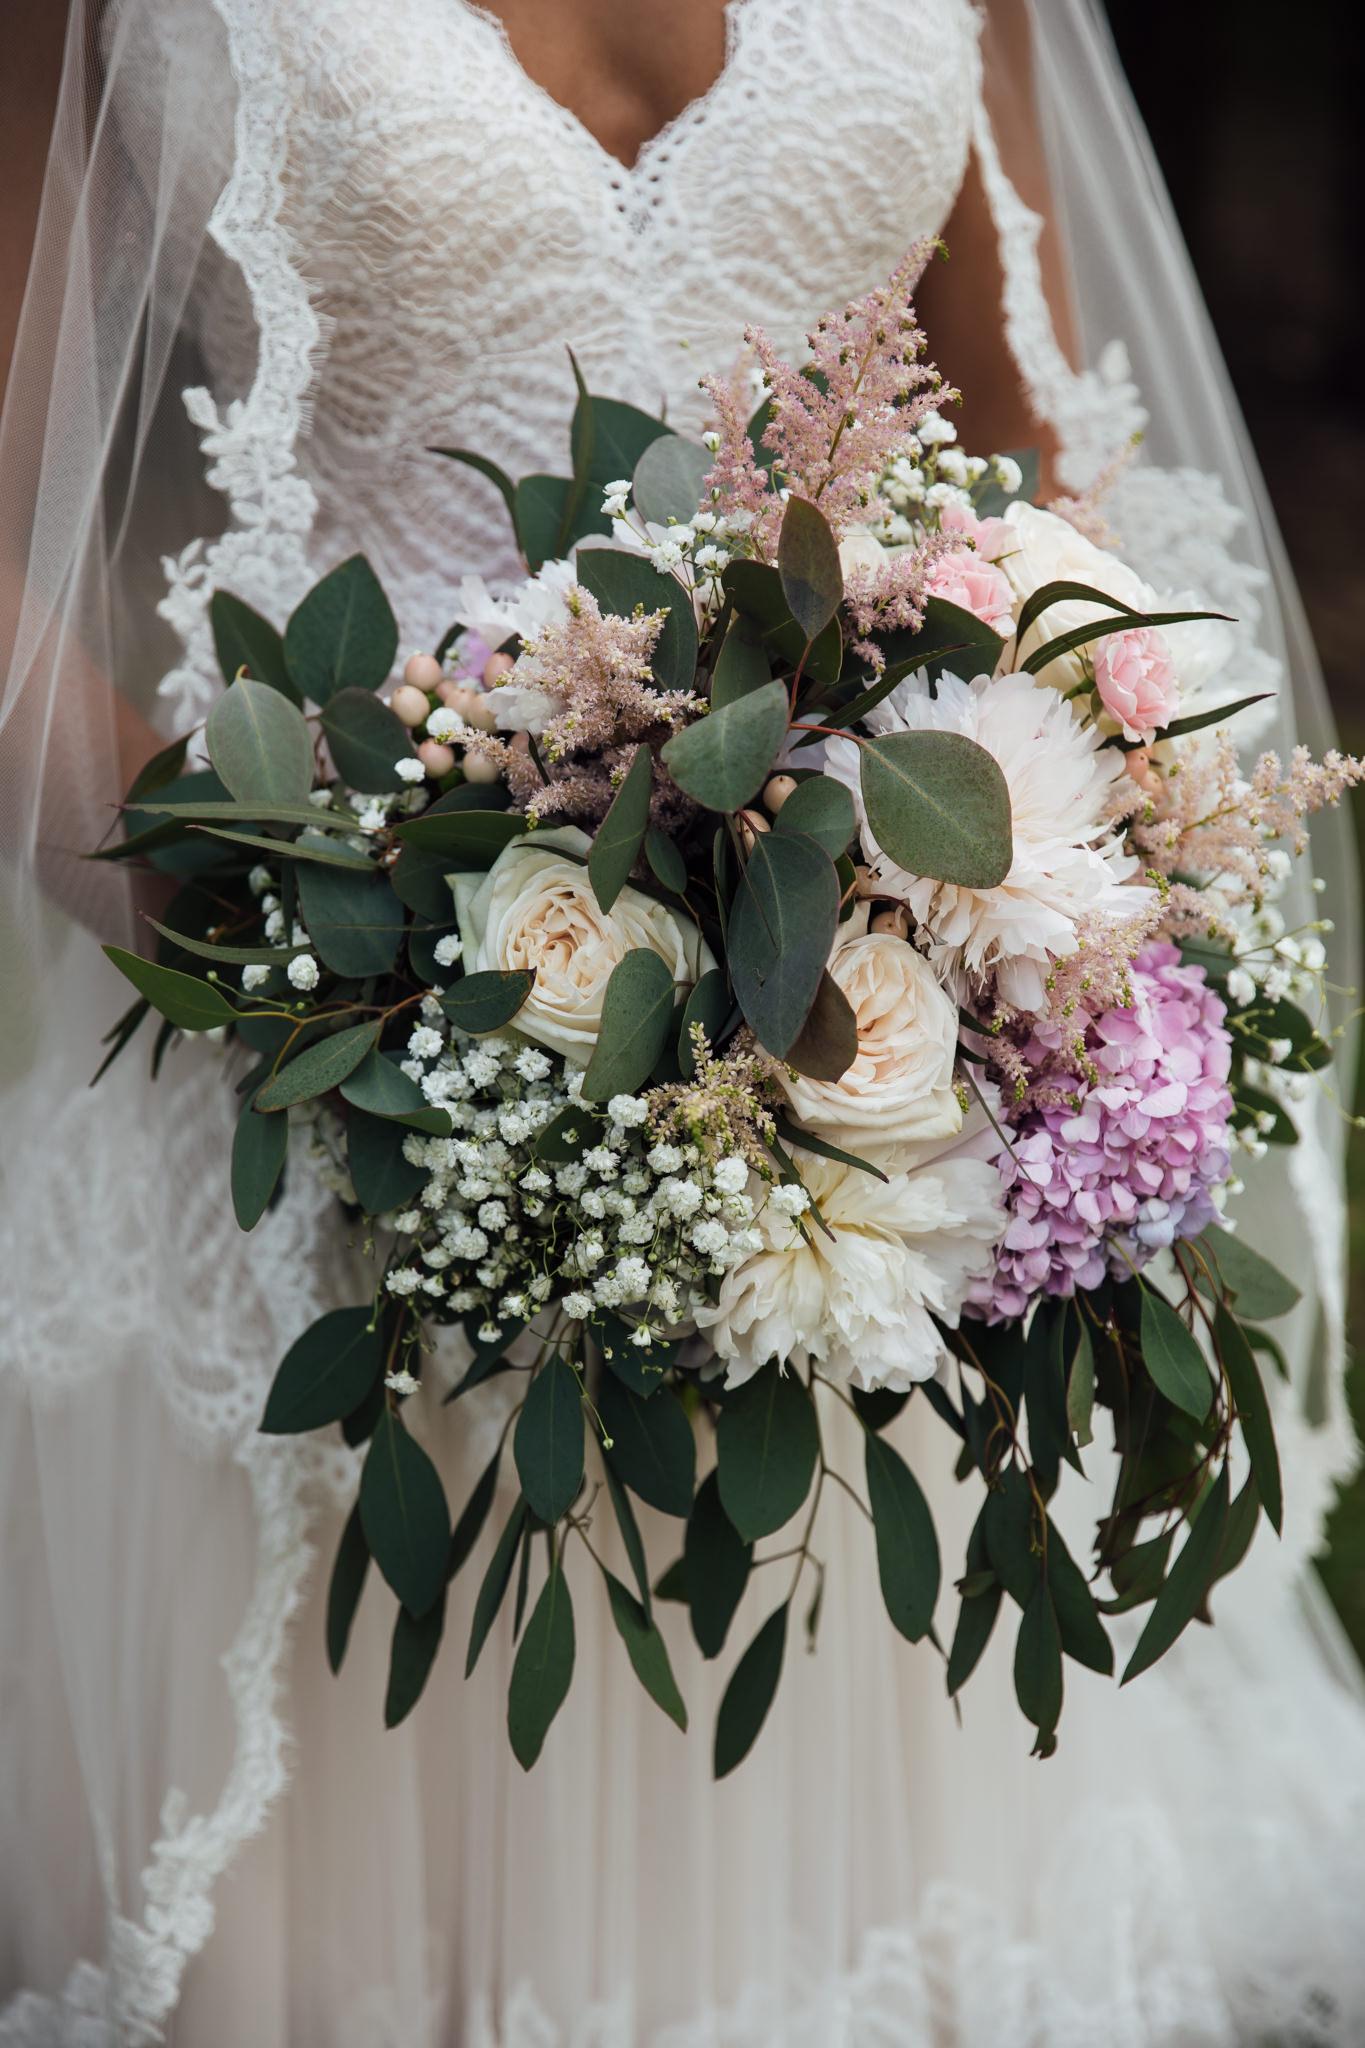 backyard-wedding-thewarmtharoundyou-lexy-branson-44.jpg